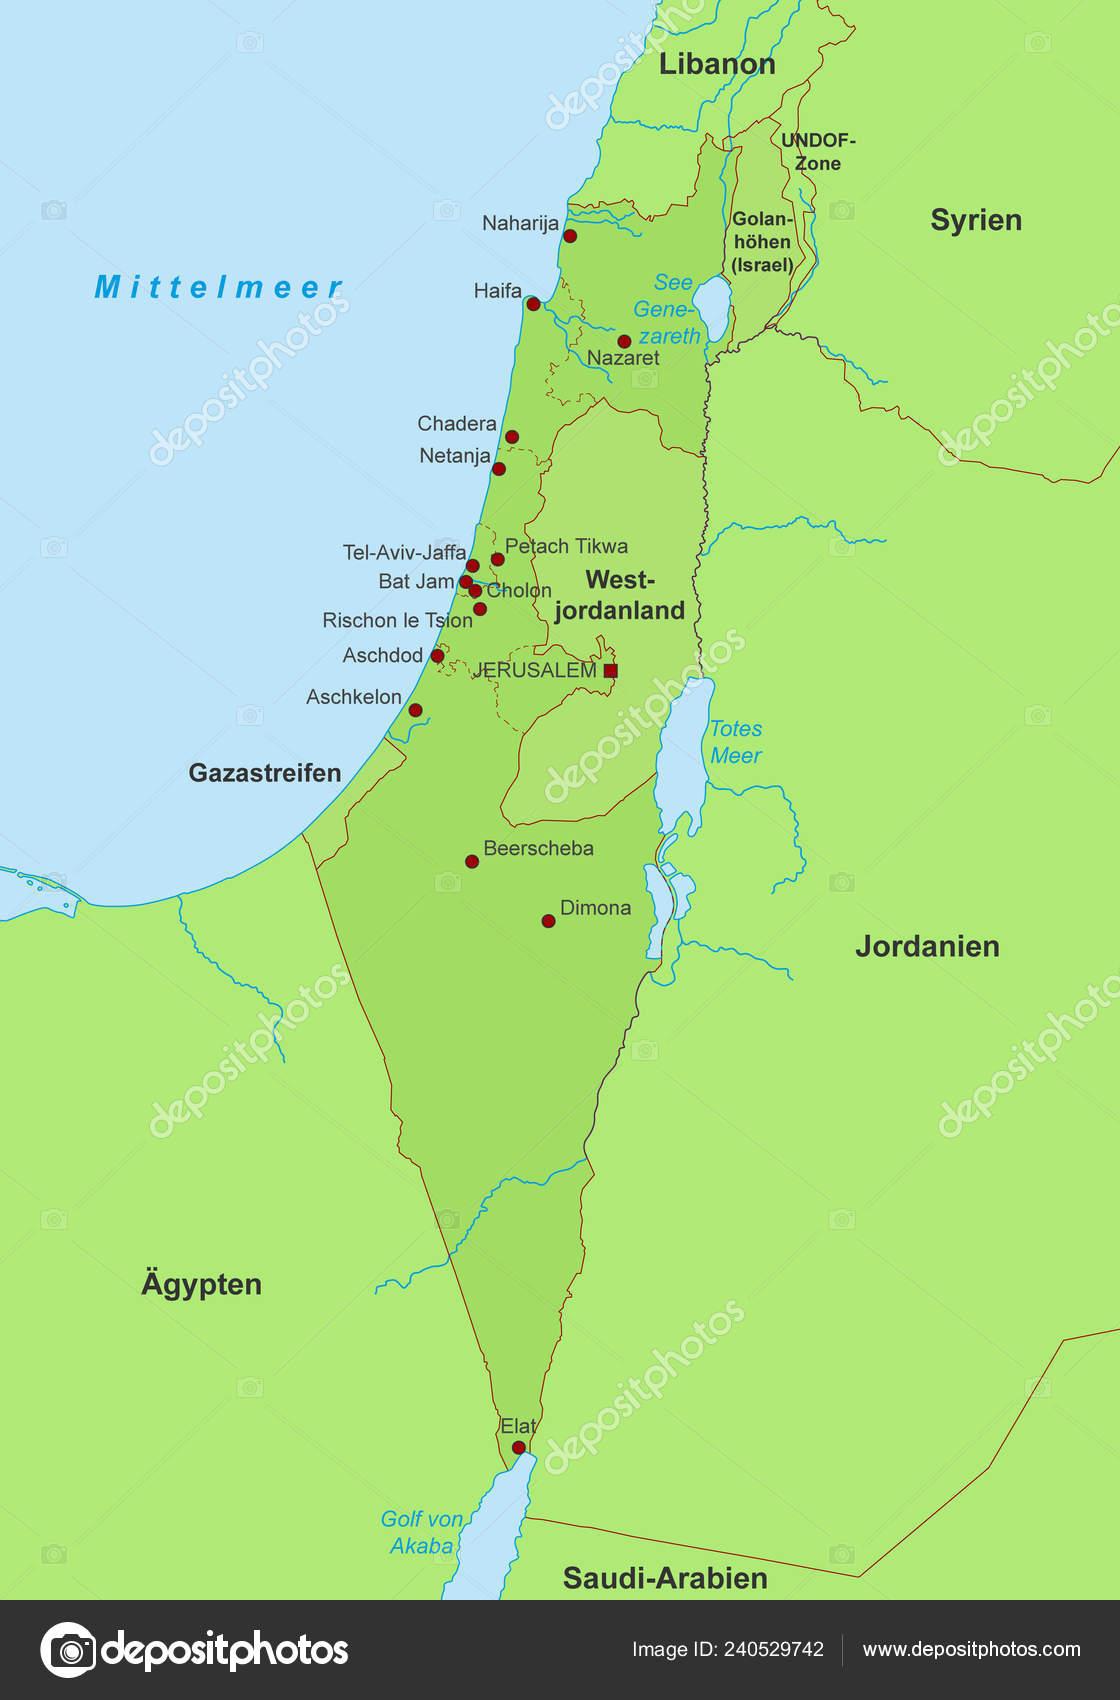 Israel Karte.Karte Von Israel Detaillierte Vektor Datei Stockvektor Ii